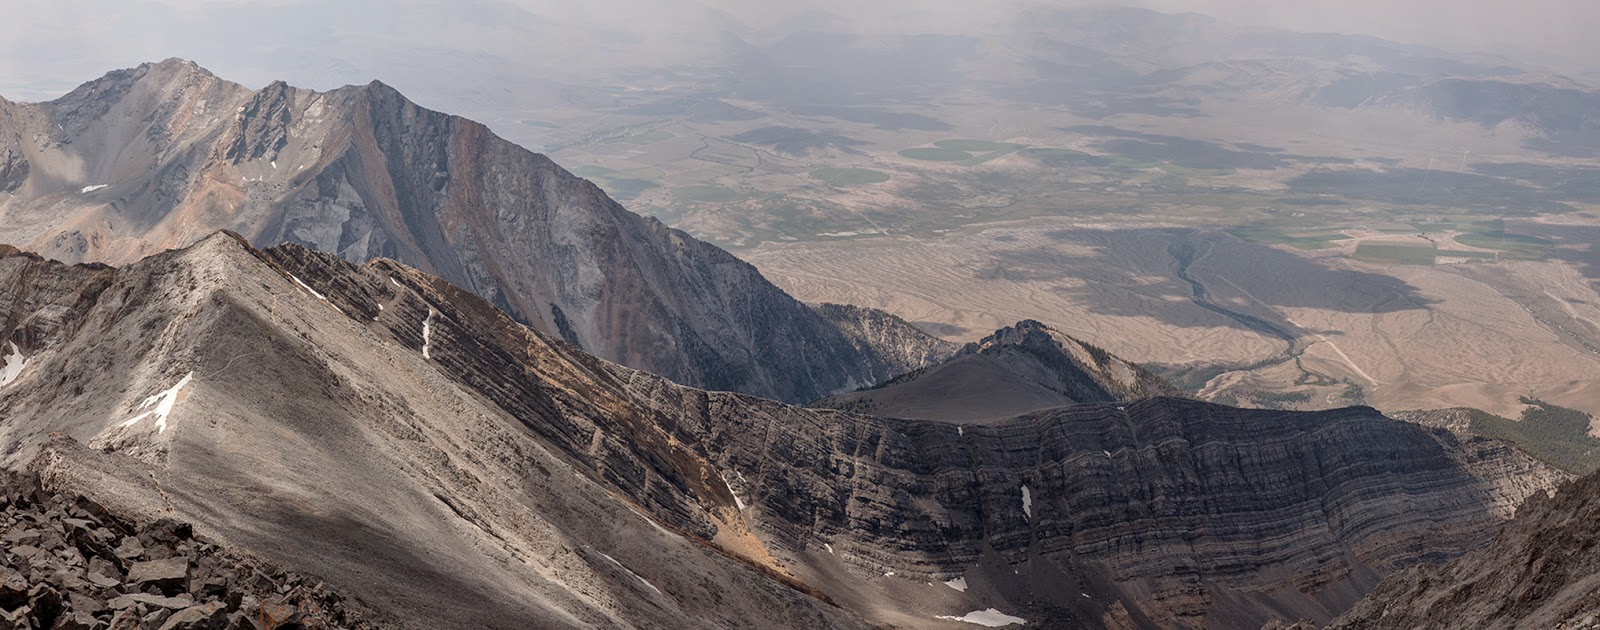 mount borah Idaho